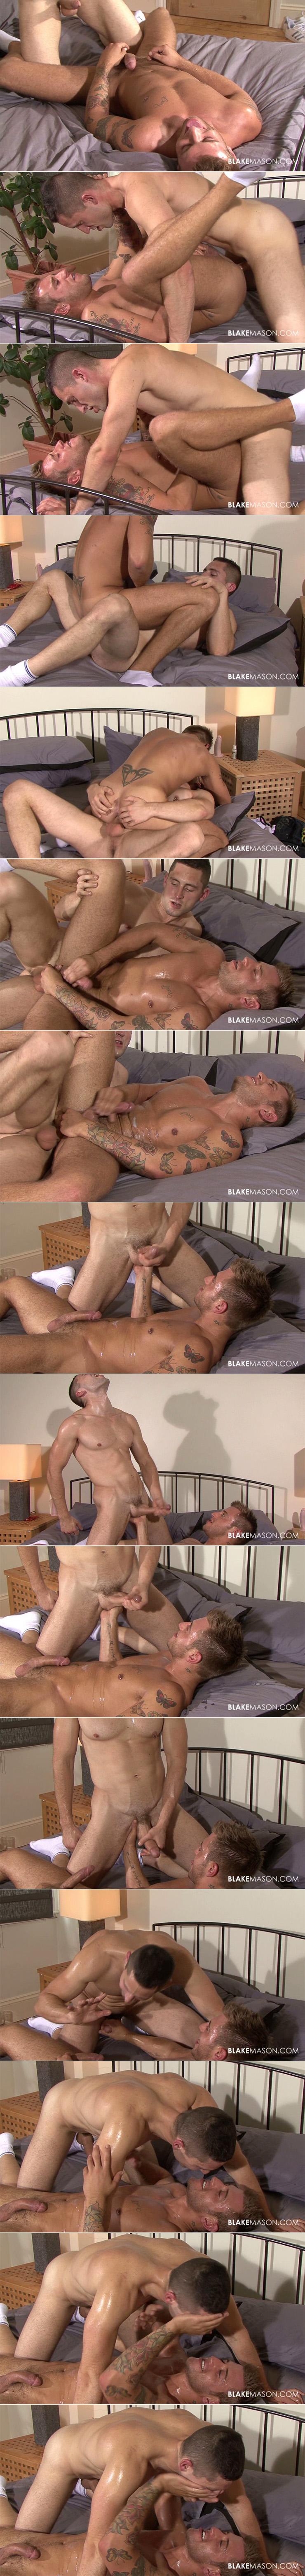 BlakeMason Dominic Belko Jed Gay Condom Sex Uncut Cock European Porn Tattoos White Socks Massive Cumshot Sweaty Sex stills